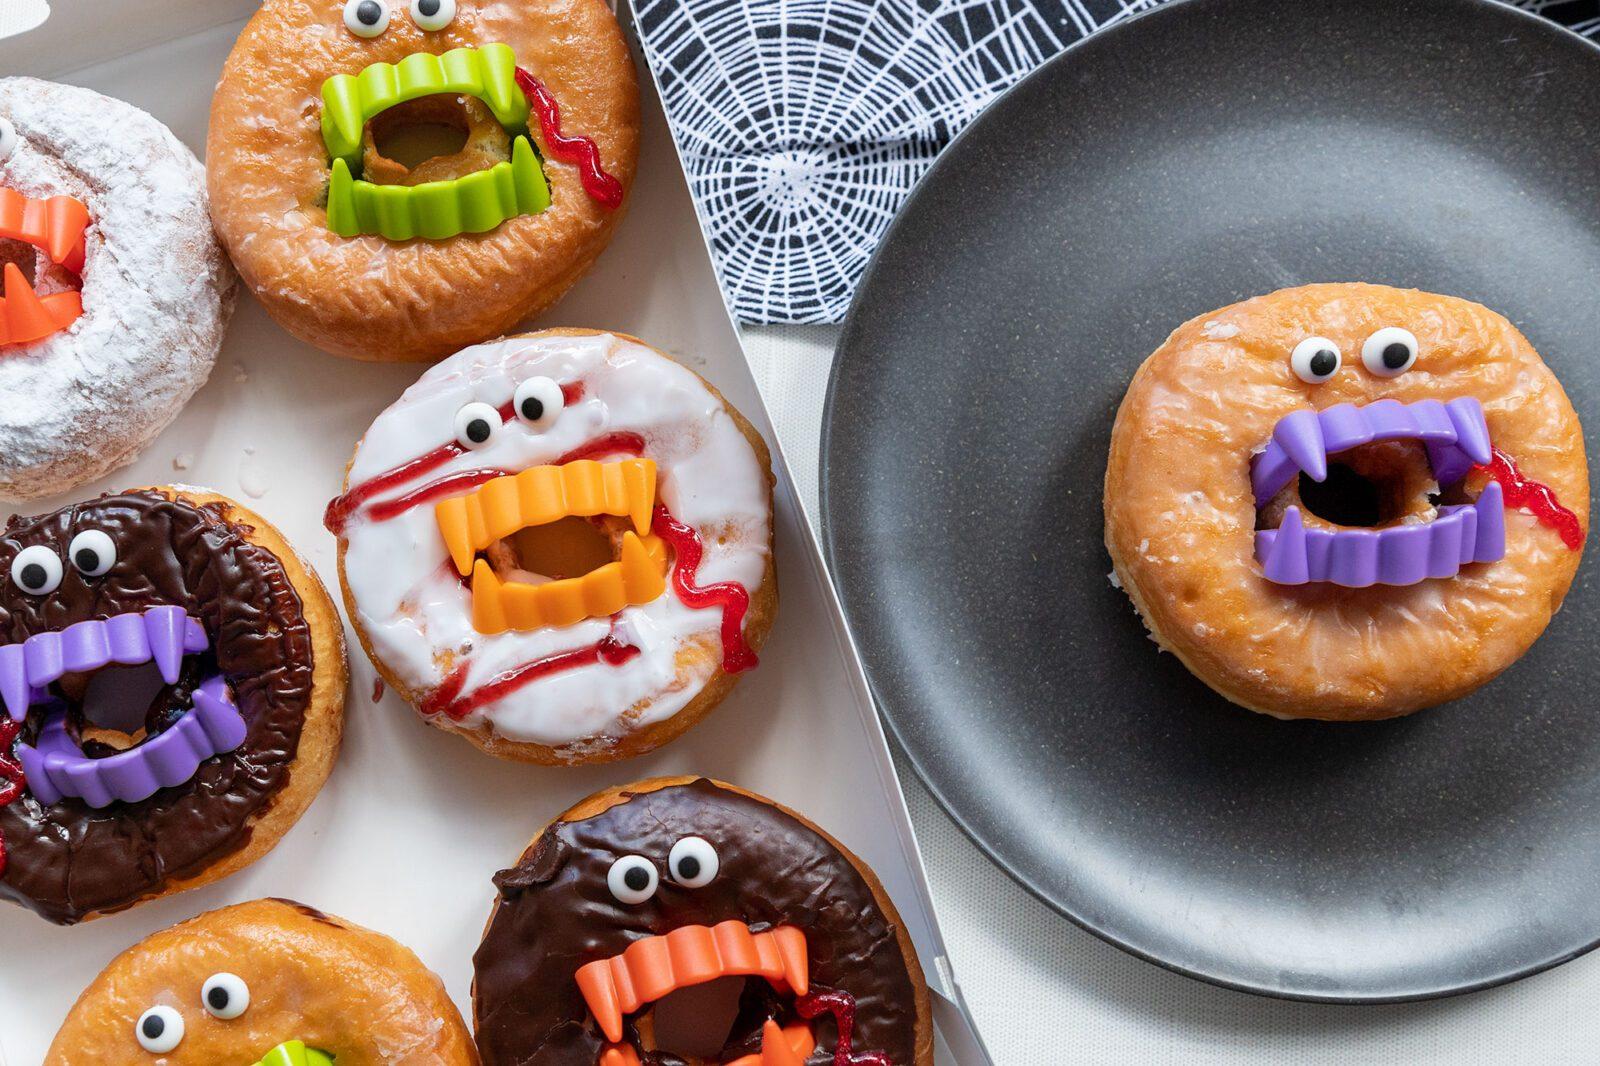 donut vampires perfect for Halloween